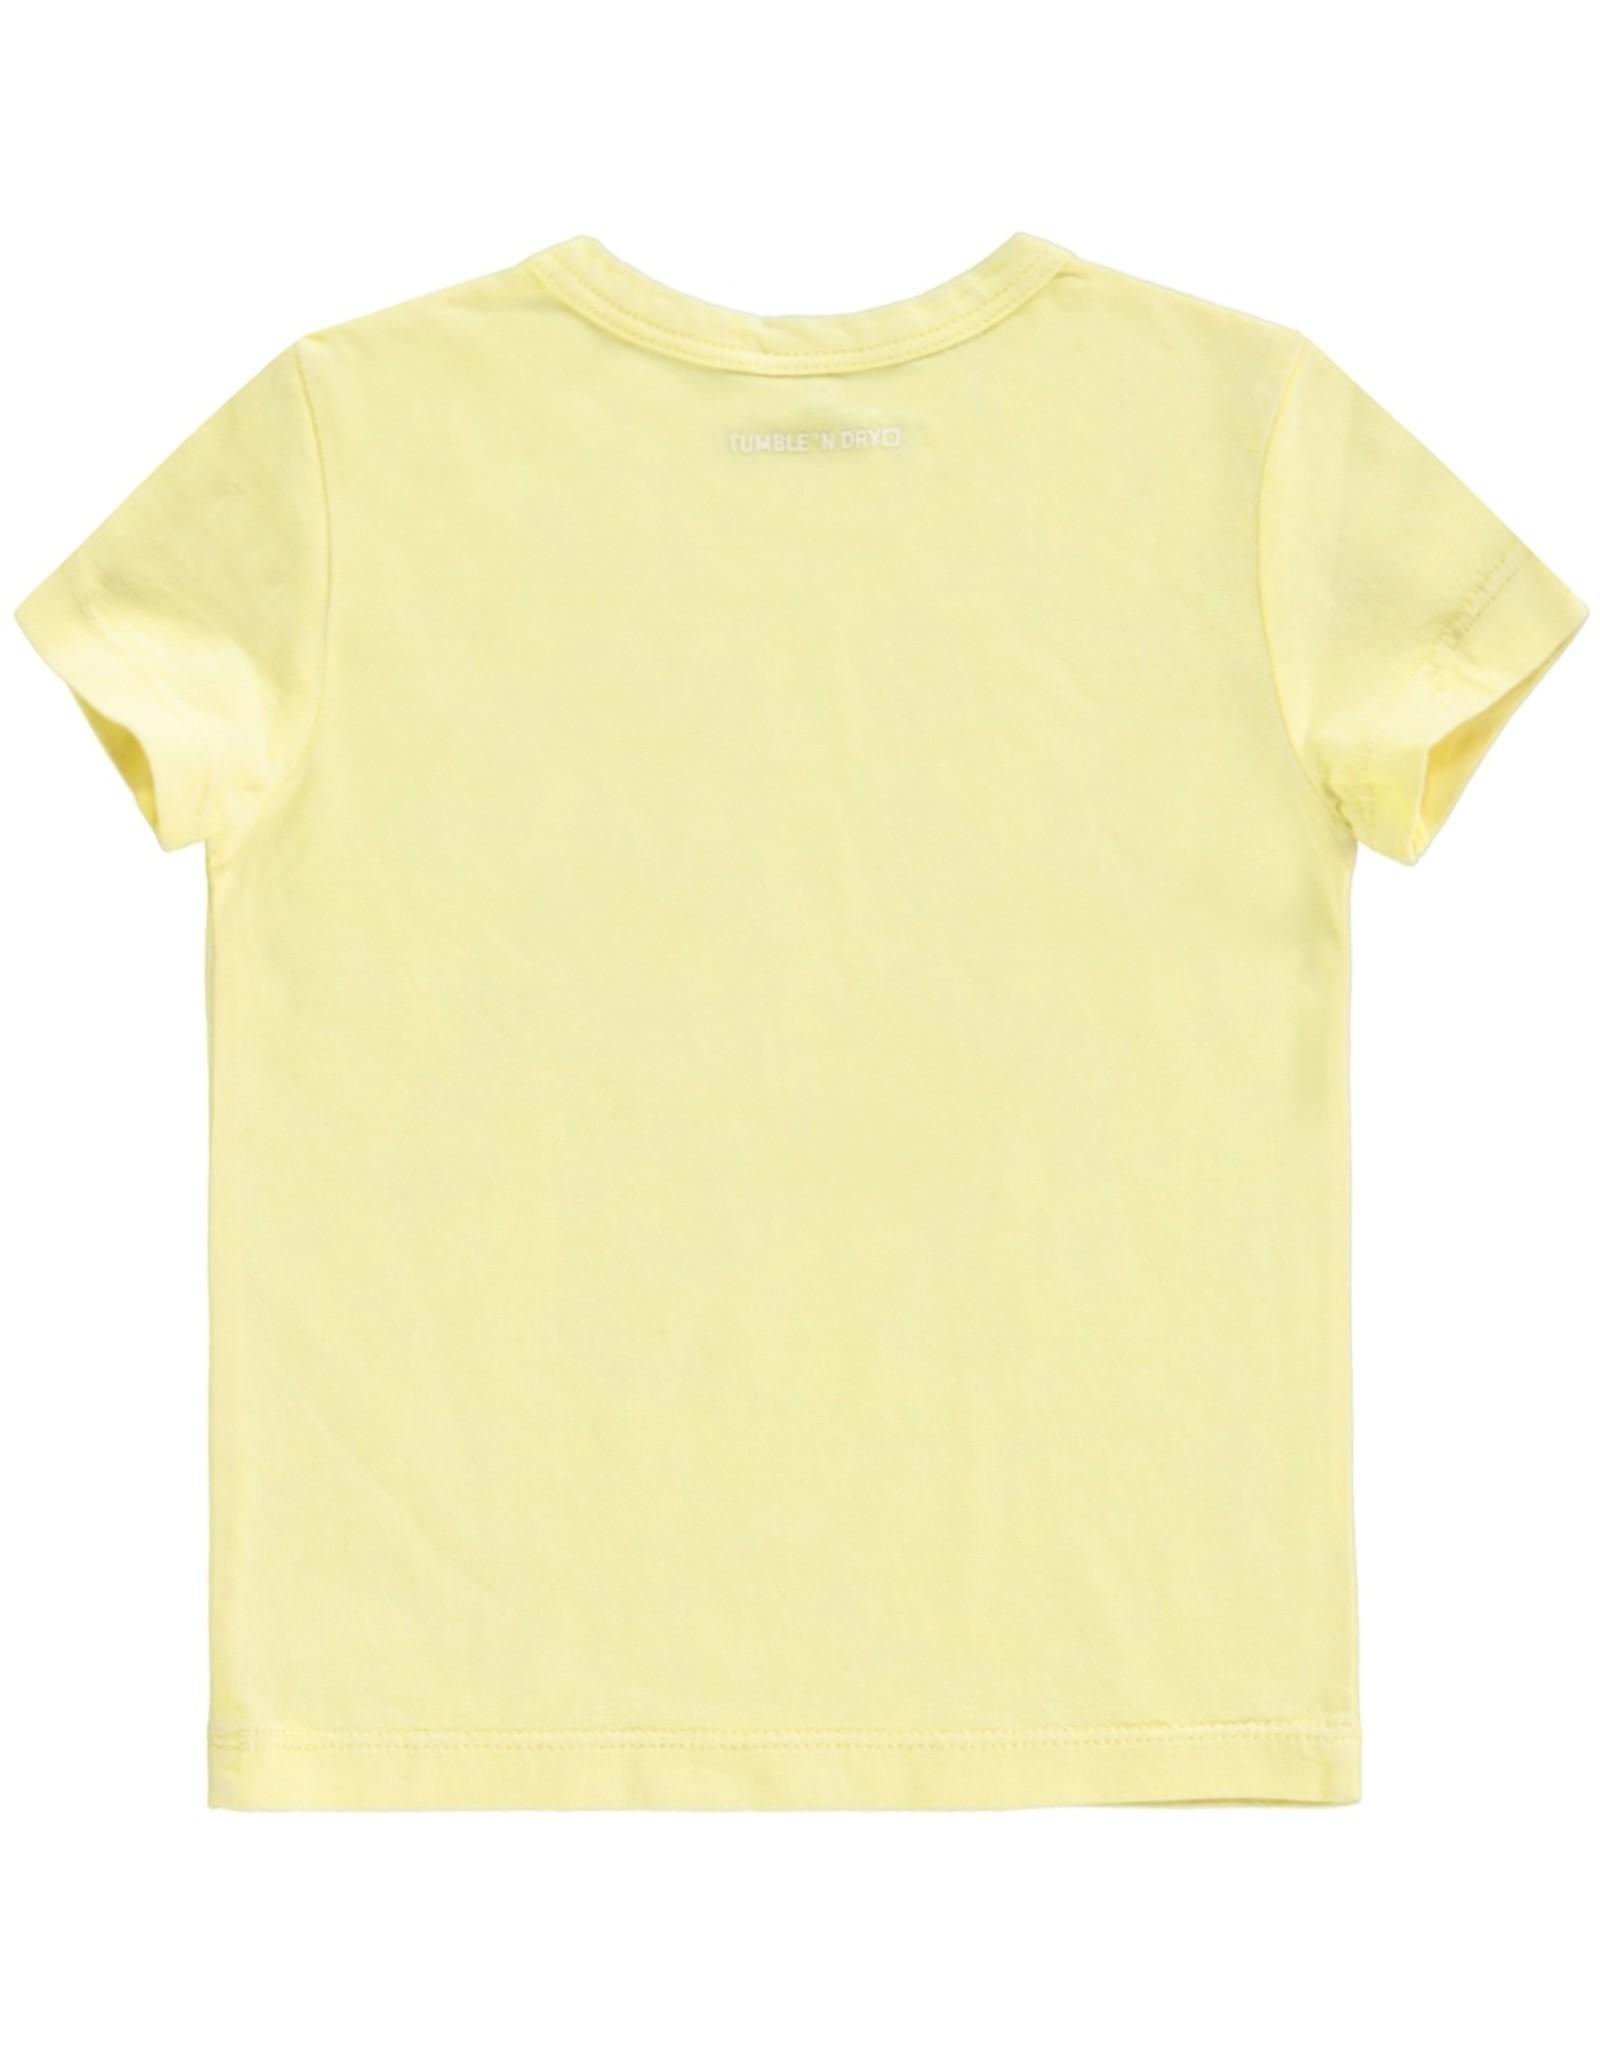 TUMBLE 'N DRY Tumble 'N Dry Boys Lo - Adex Yellow Corn Acadia